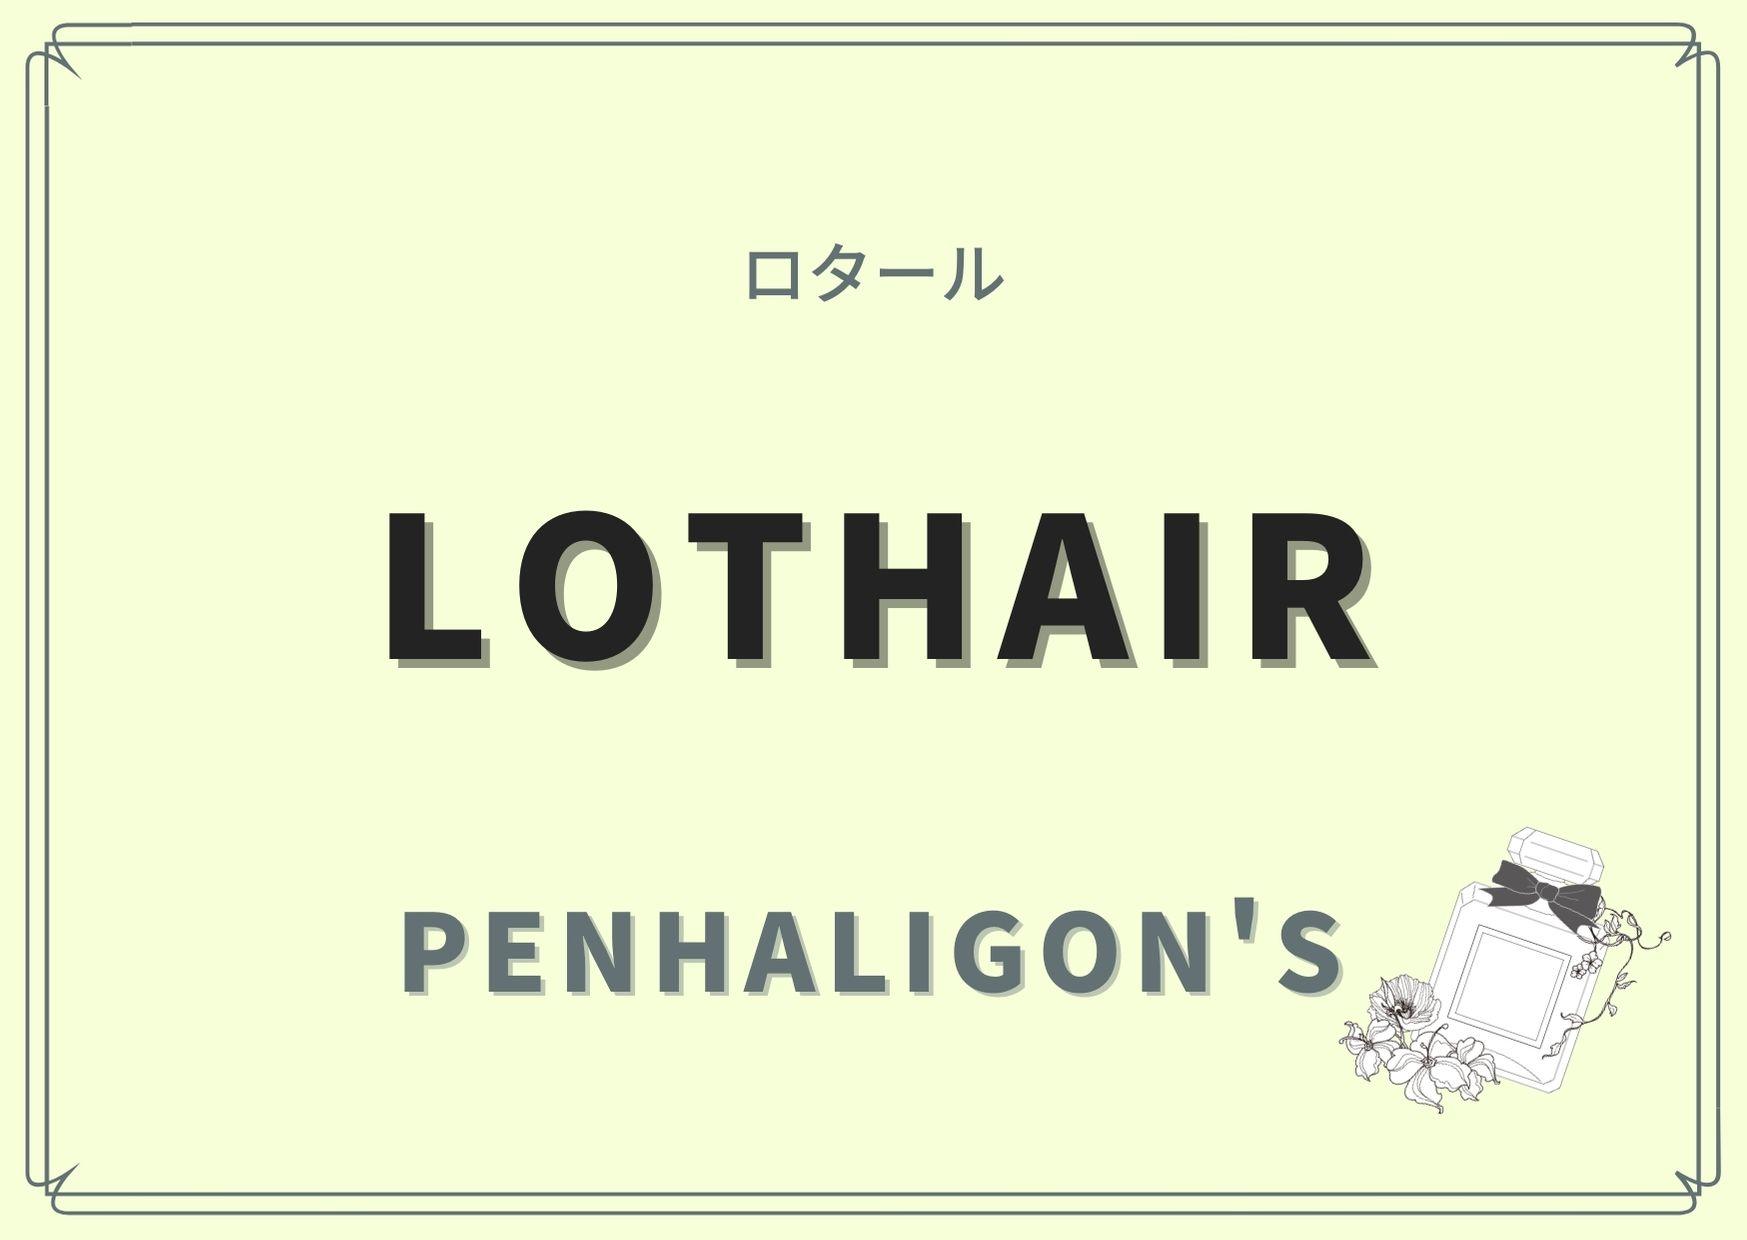 LOTHAIR(ロタール)/PENHALIGON'S(ペンハリガン)